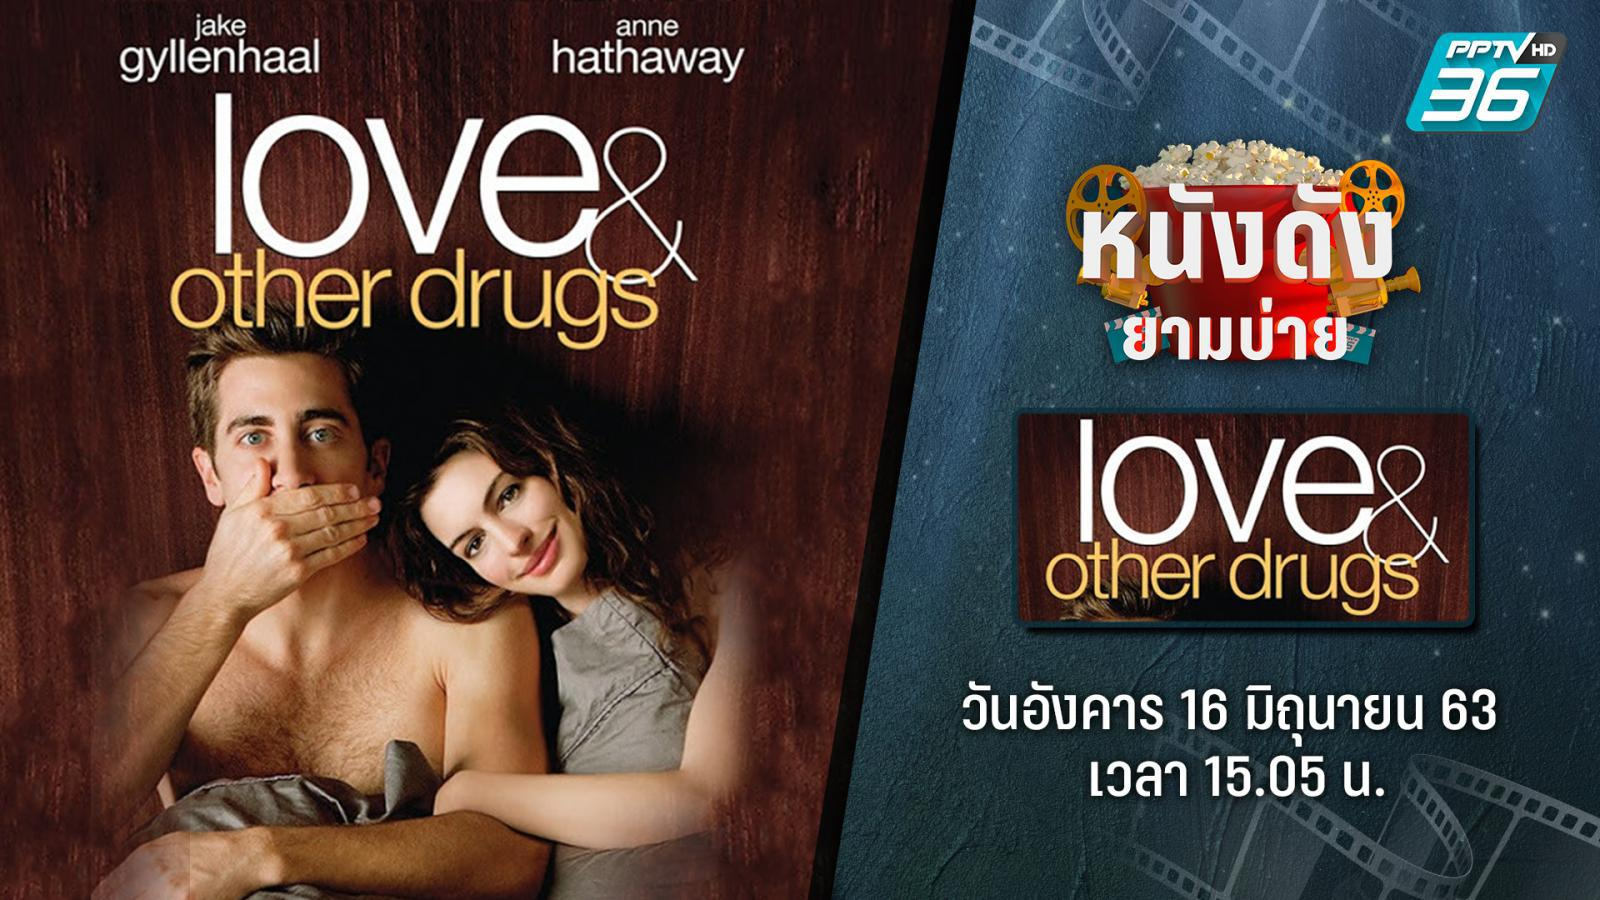 Love & Other Drugs ยาวิเศษที่ไม่อาจรักษารัก